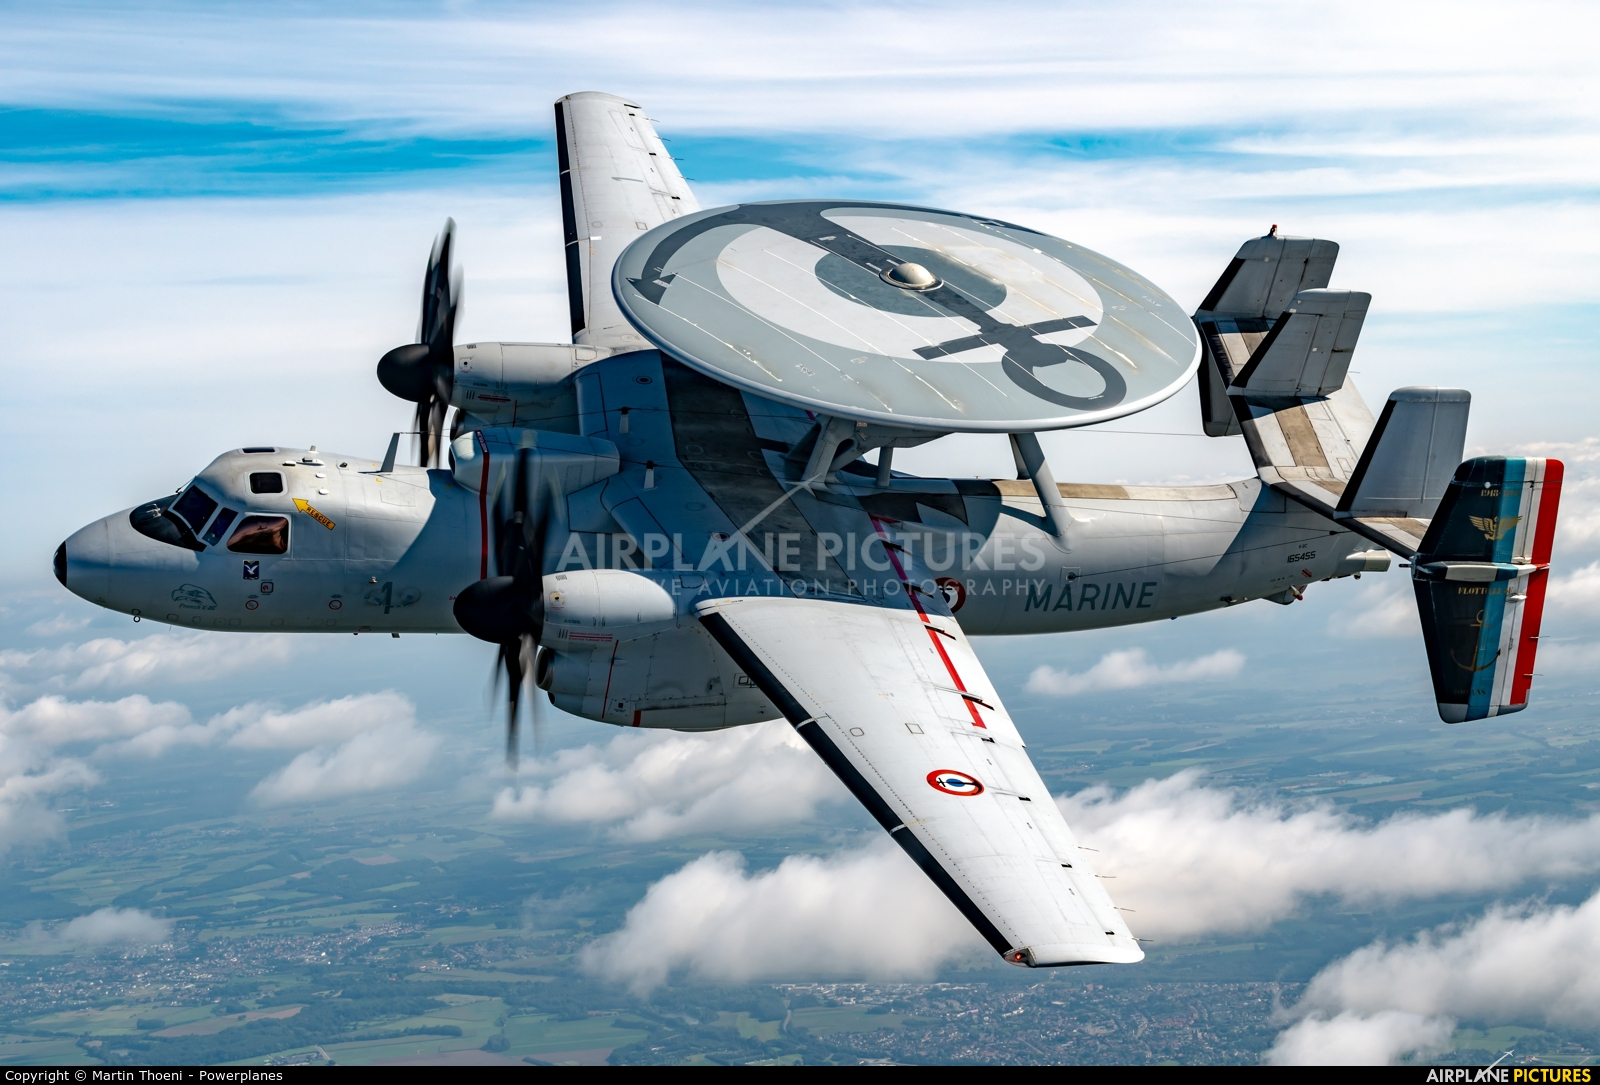 France - Navy 165455 aircraft at In Flight - Belgium